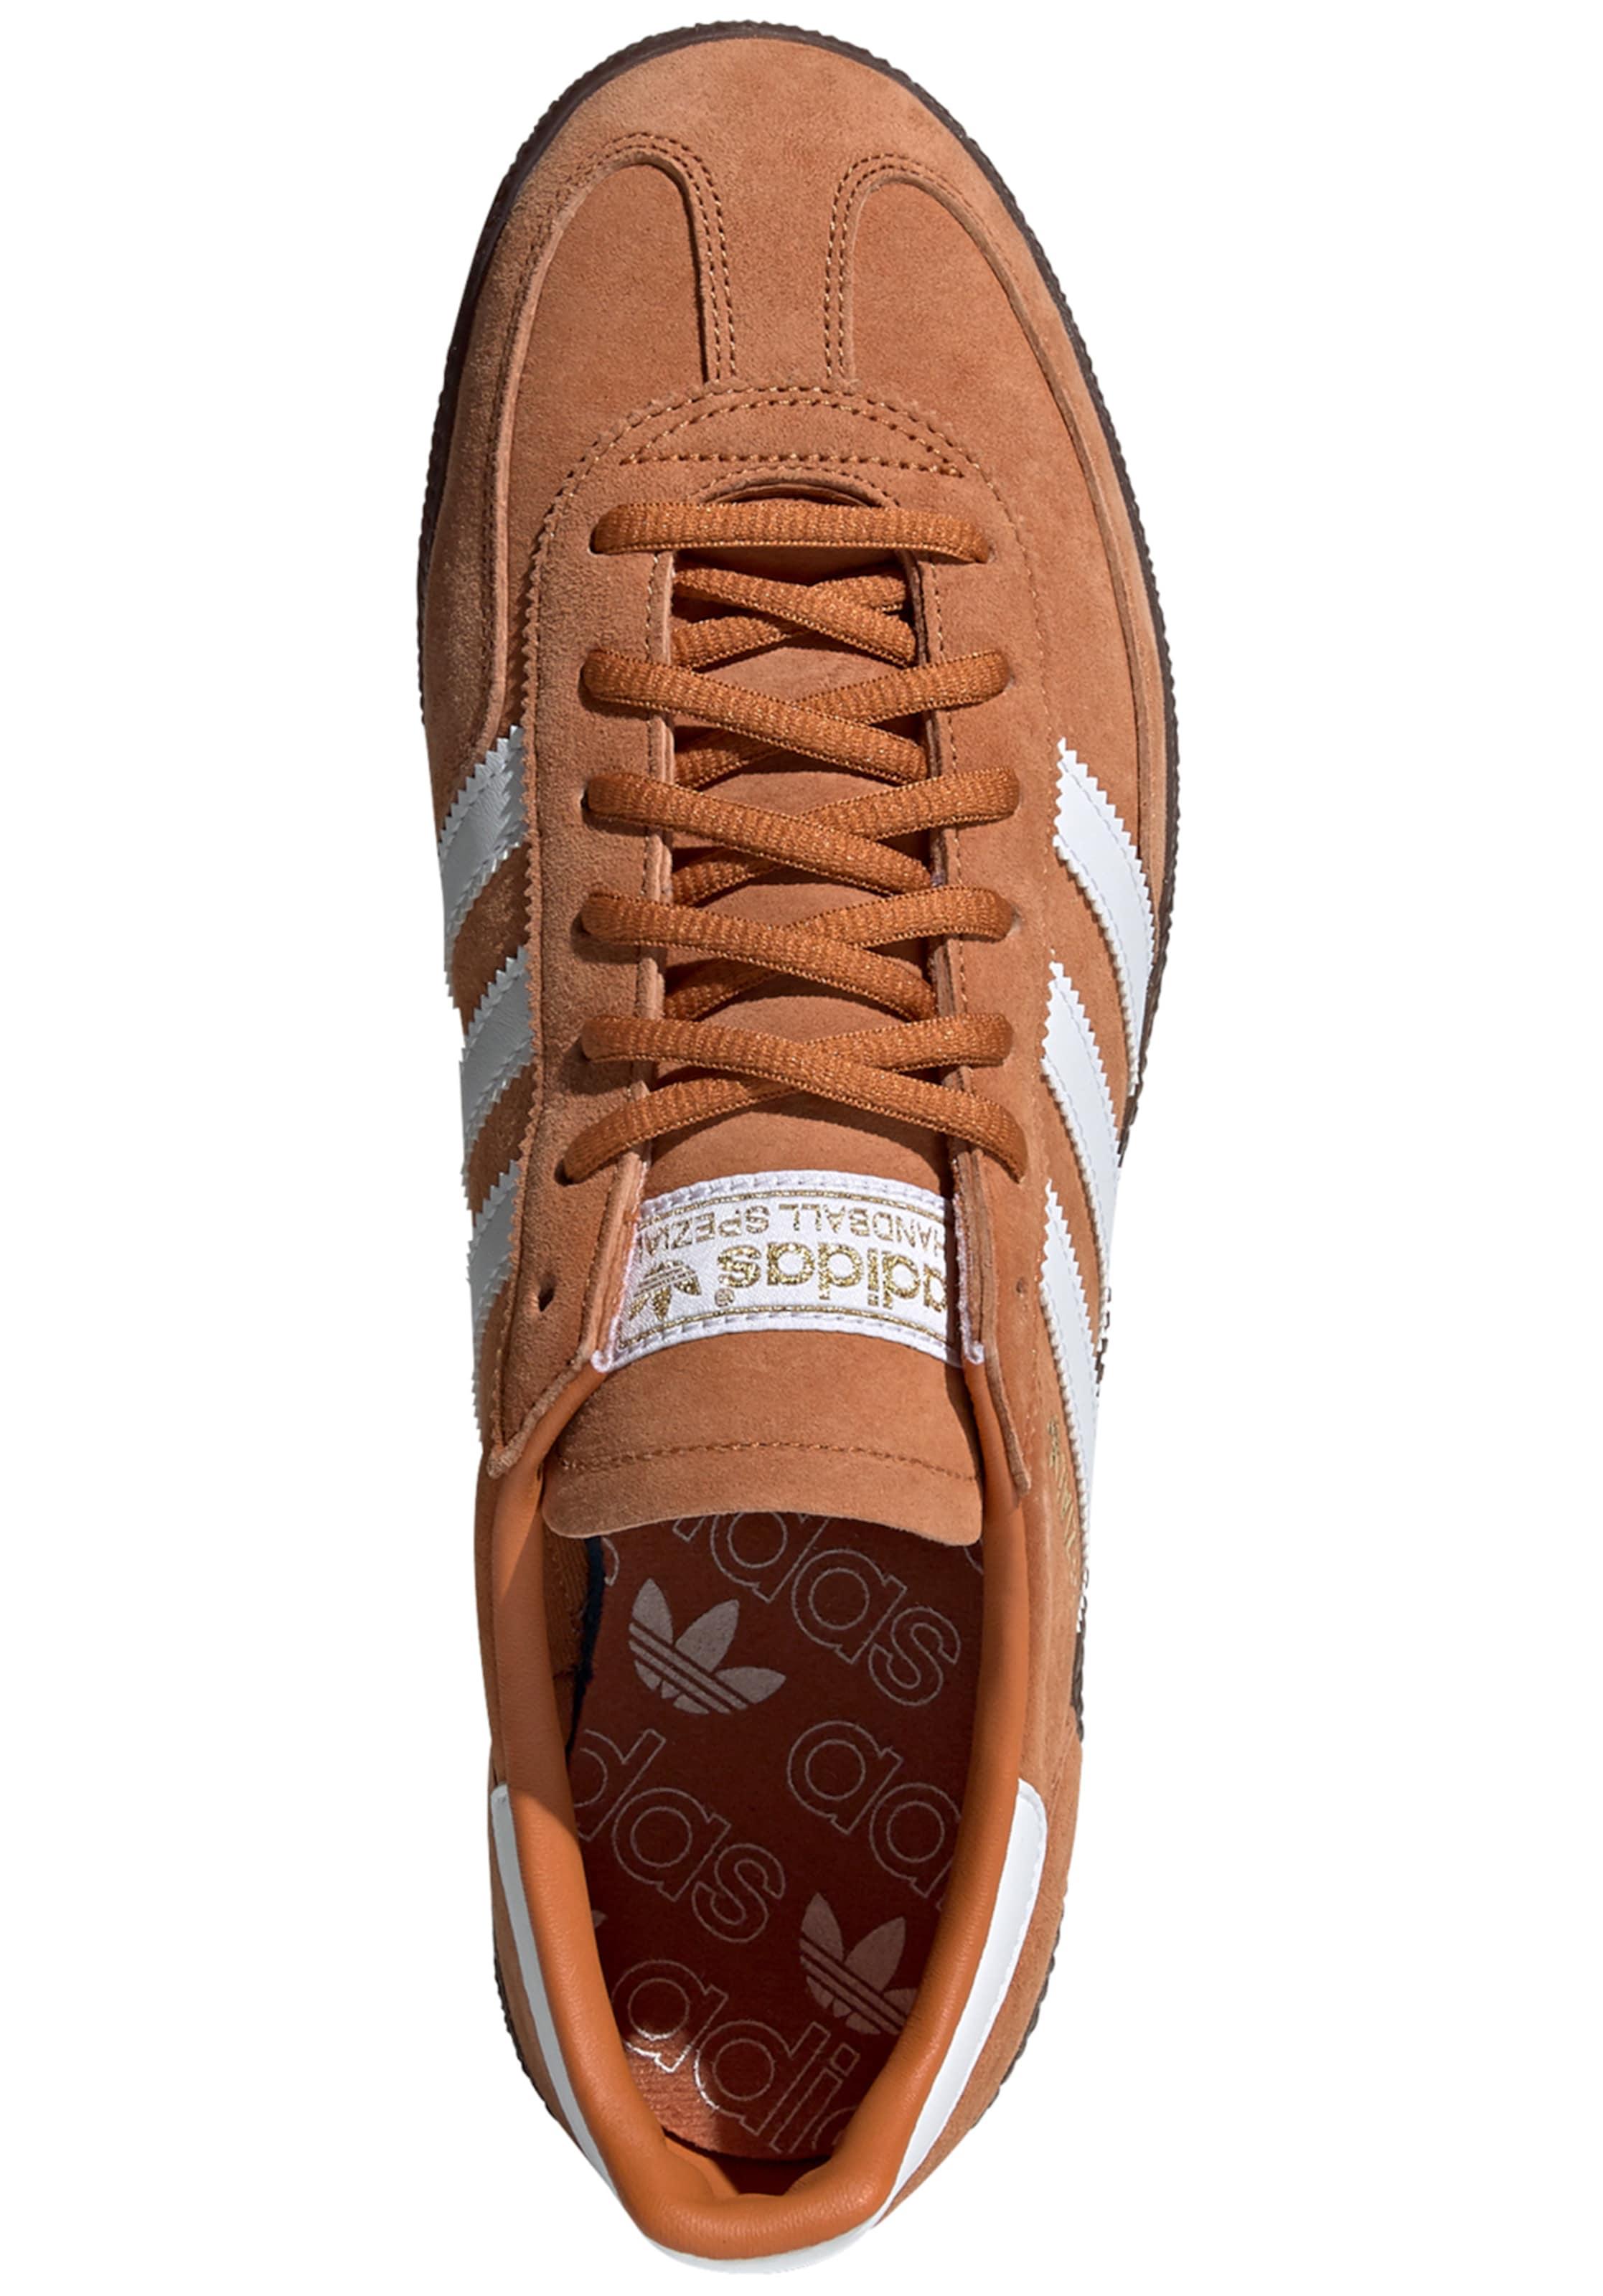 Spezial' BraunWeiß Originals 'handball In Adidas Schuhe R34ALc5jq